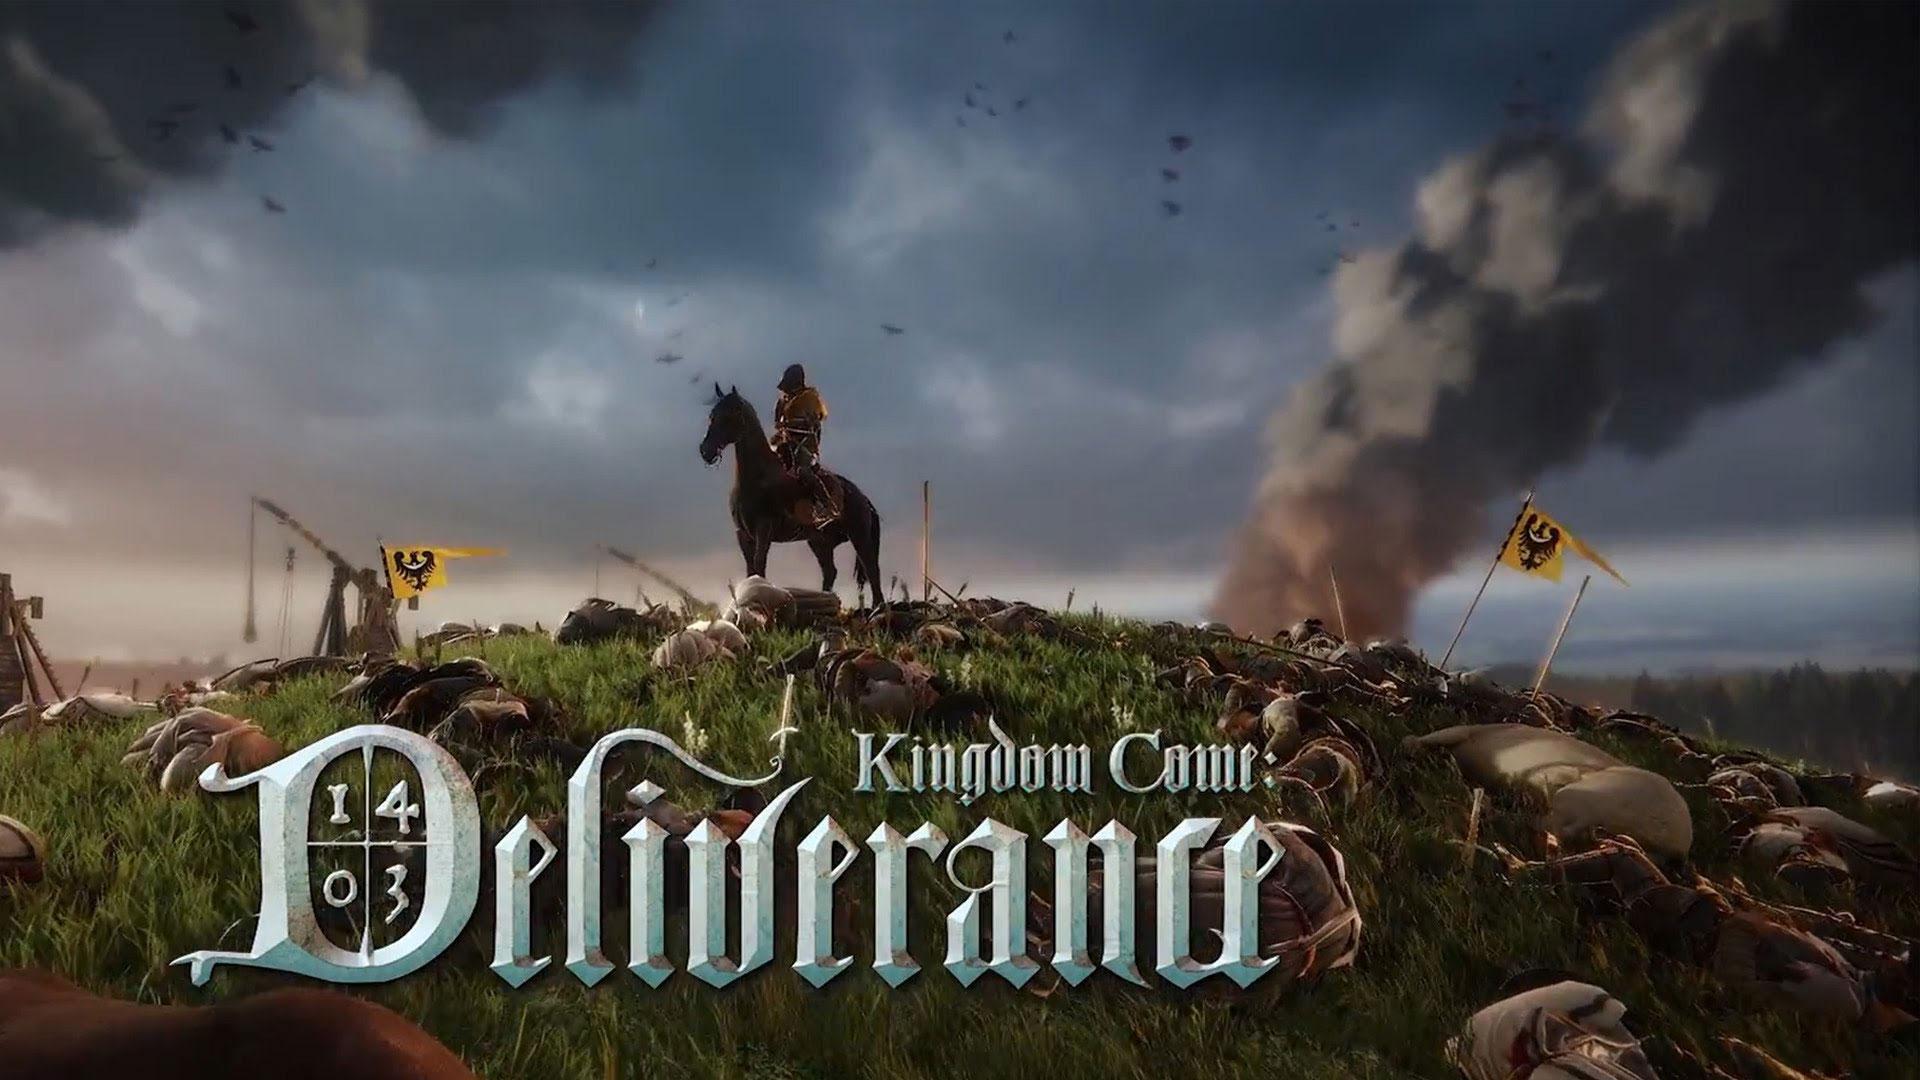 [96+] Kingdom Come: Deliverance Wallpapers on WallpaperSafari